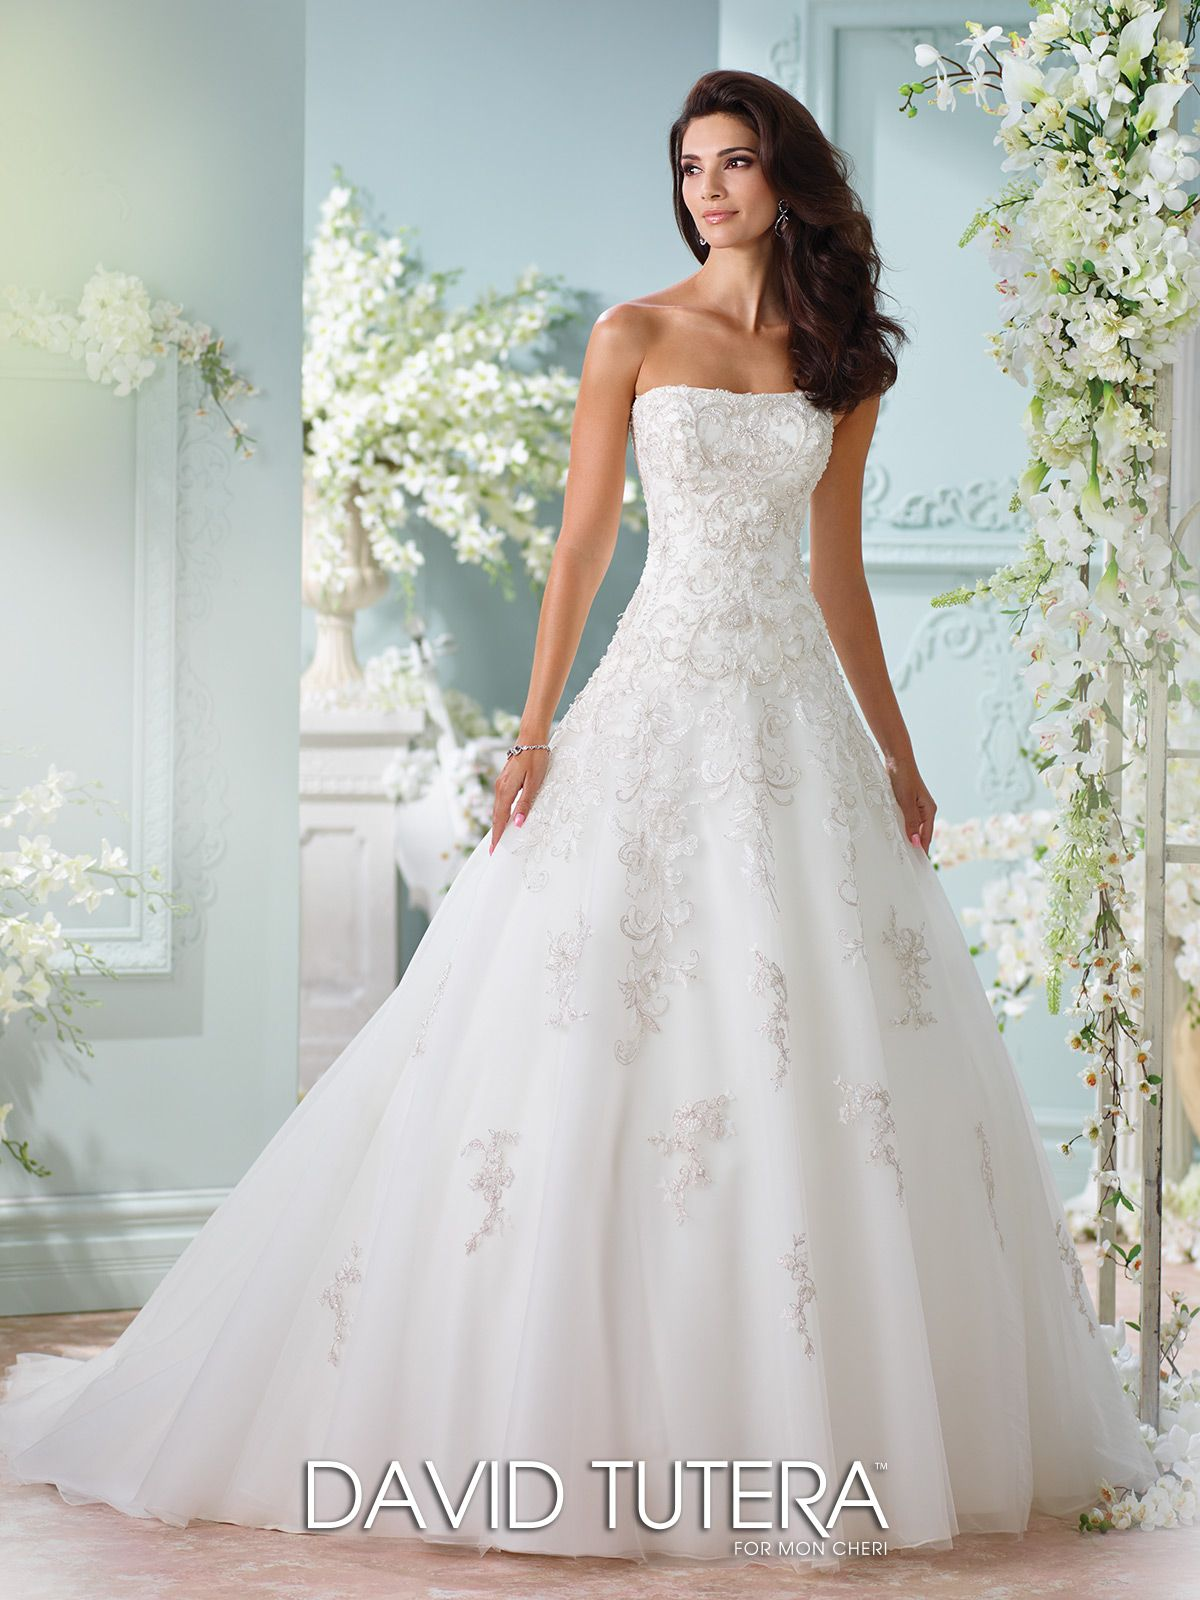 Bridal Dresses Sophia Tolli David Tutera Wedding Dresses Bridal Dresses Wedding Dresses